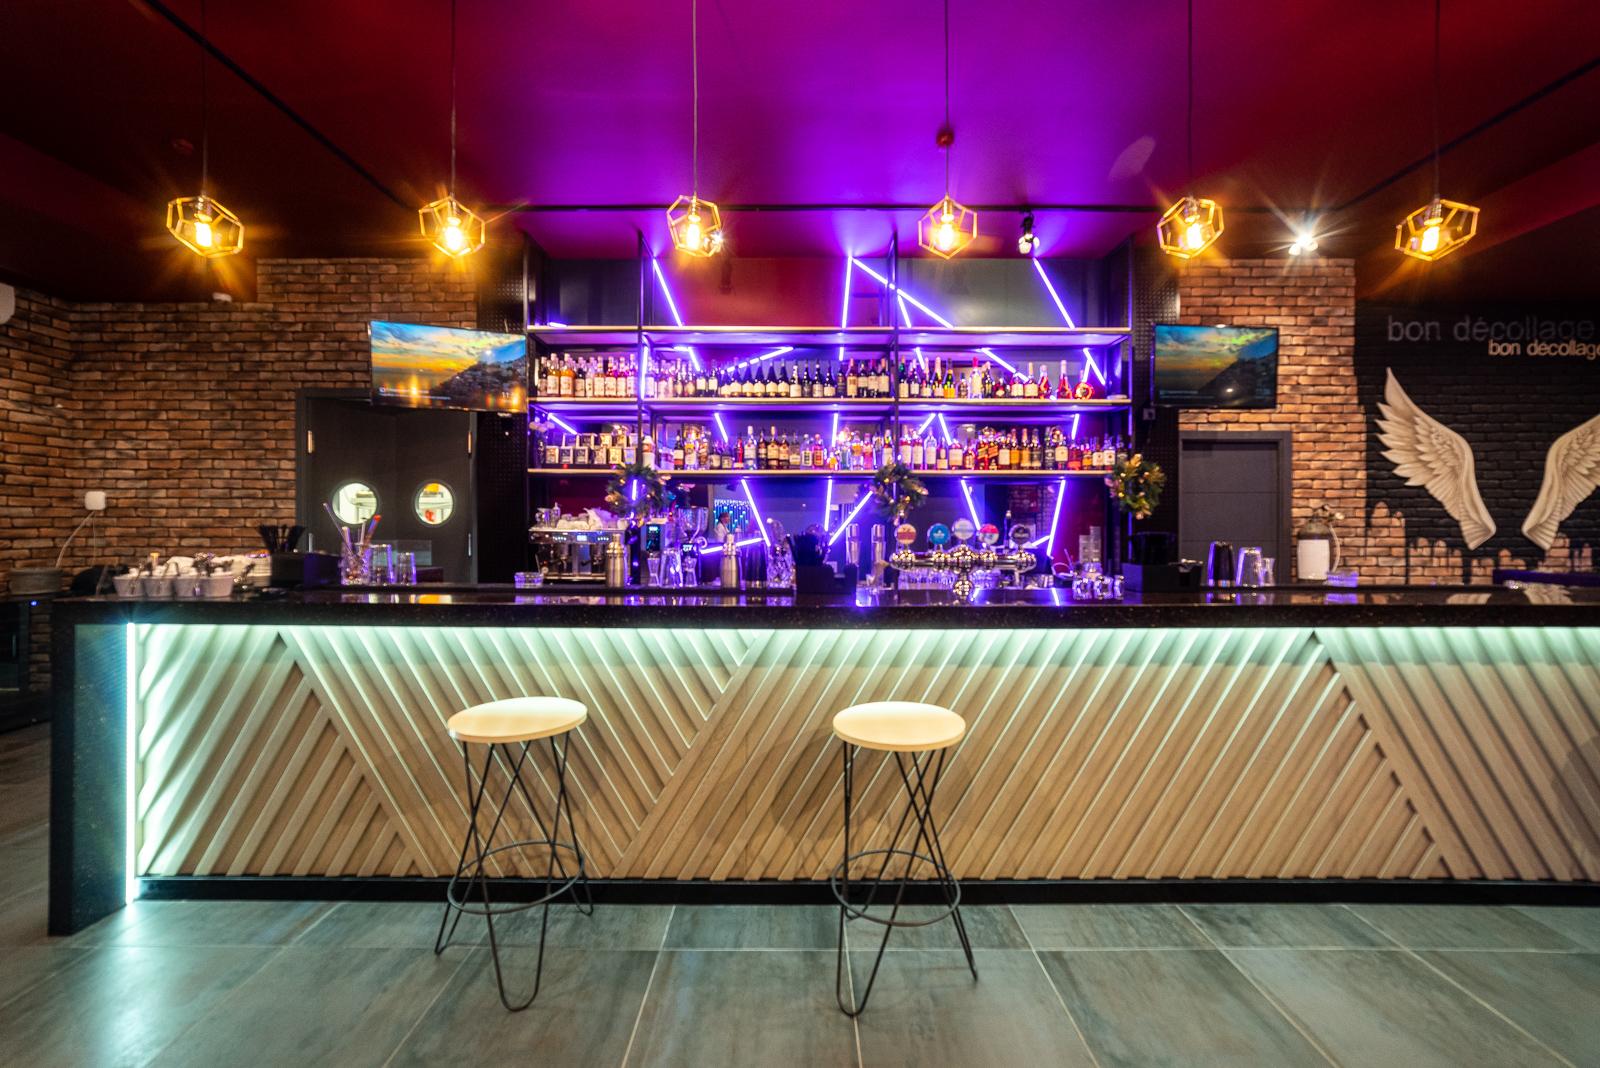 ресторан-бар, проект бара под ключ, дизайн ресторана в стиле лофт, дизайн ресторана под ключ, дизайн коммерческих помещений, дизайн интерьера, дизайн ресторана